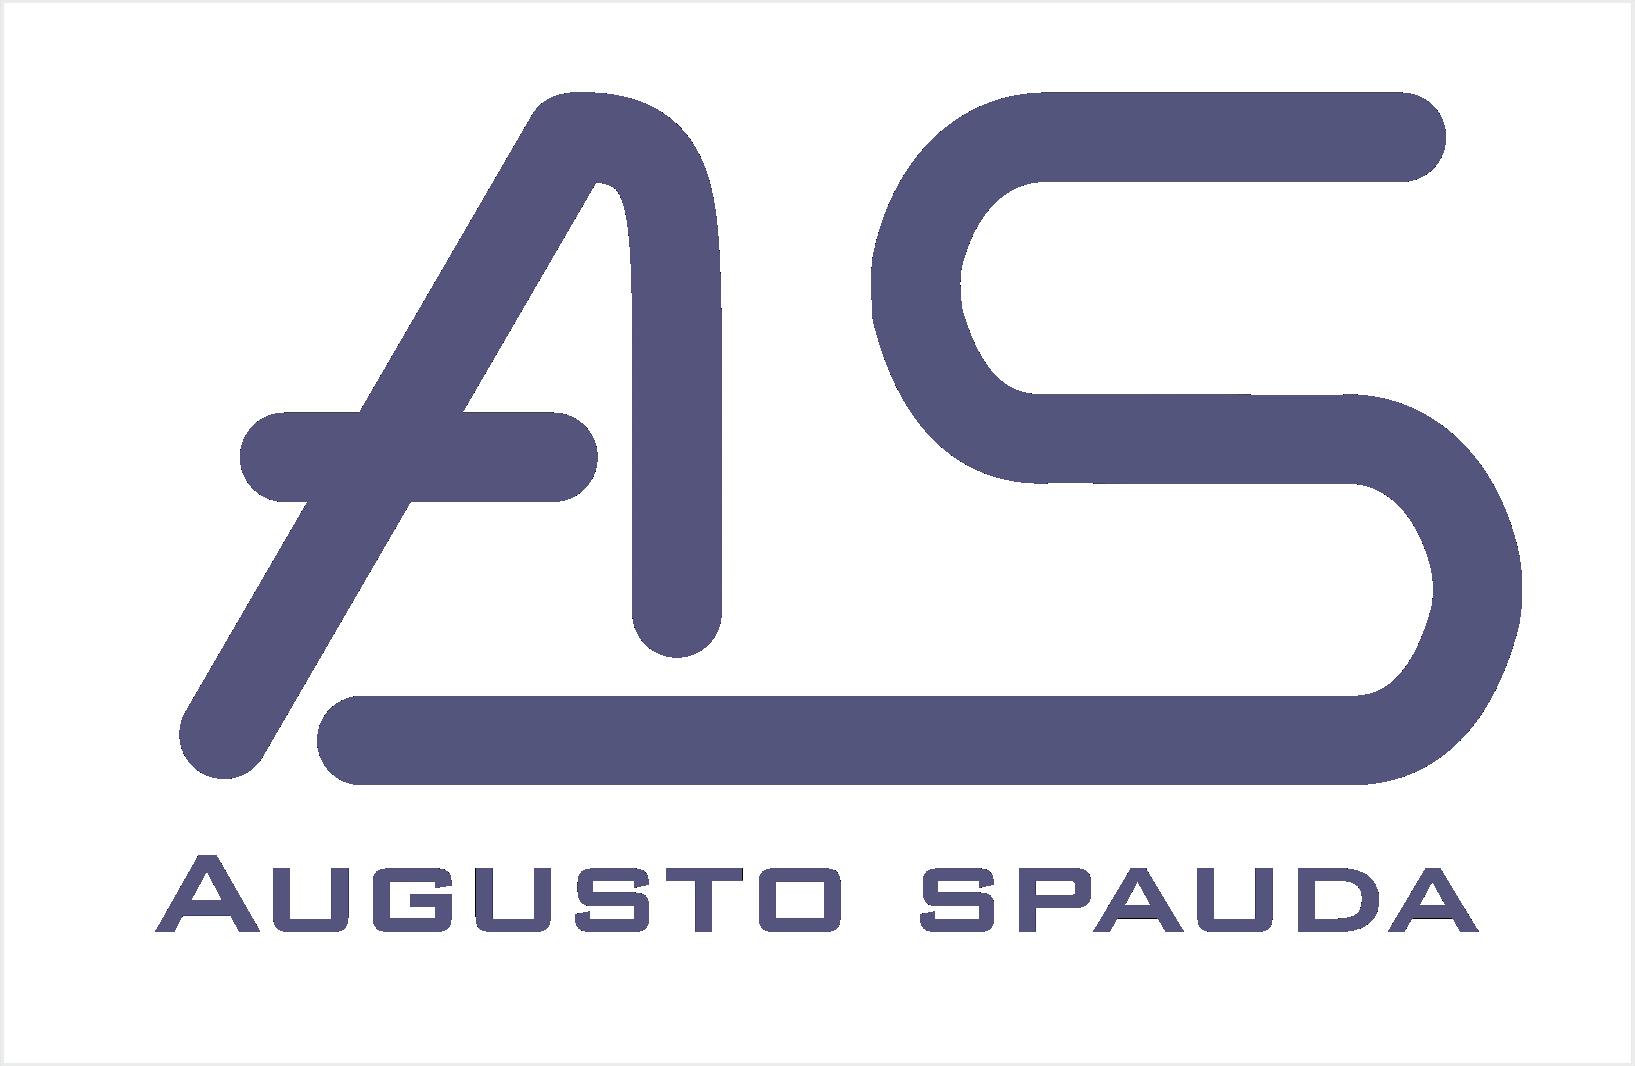 Augusto spauda